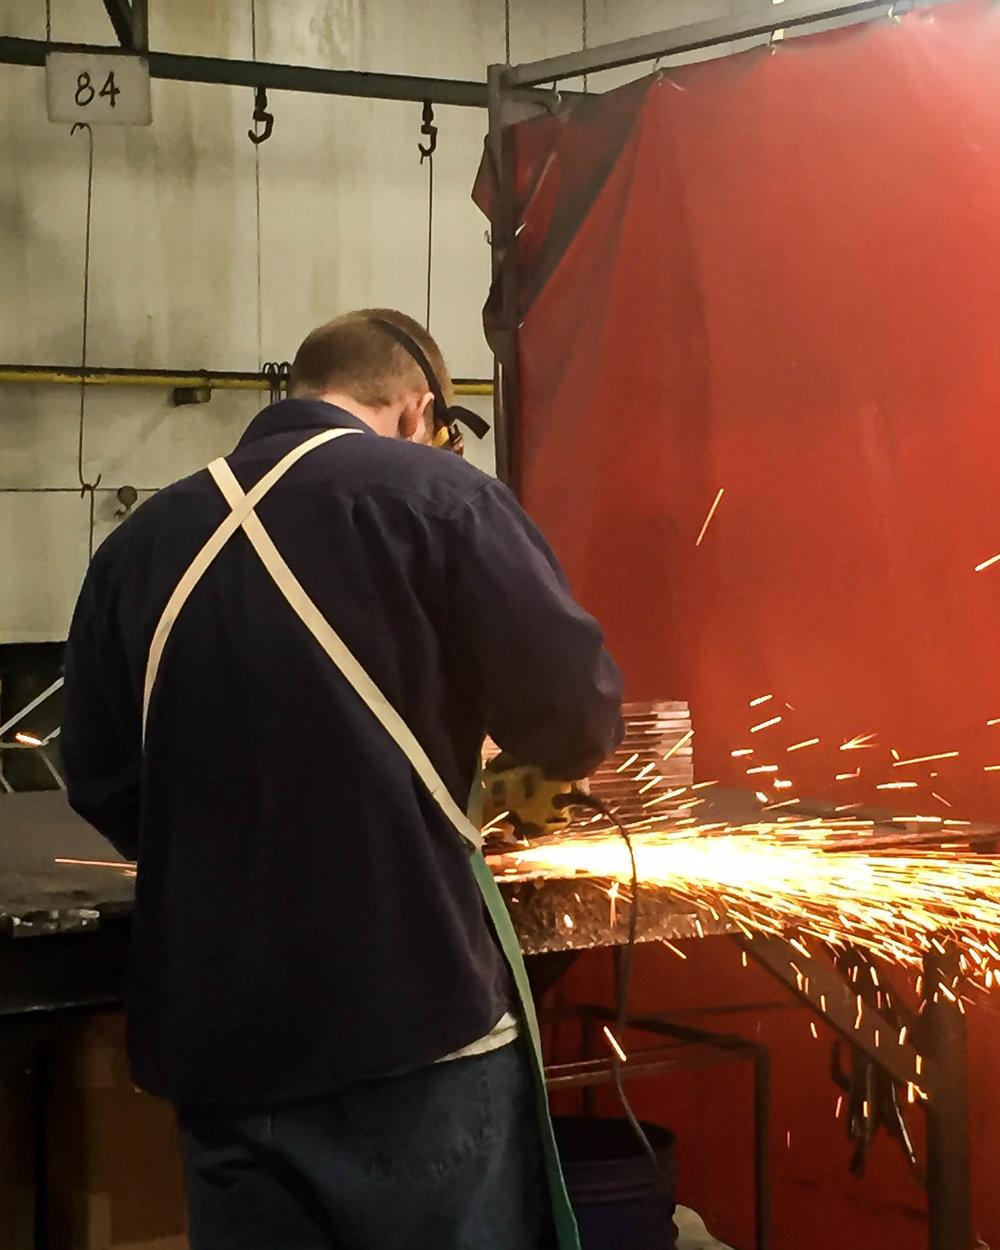 Artisan welder, custom furniture made by hand.